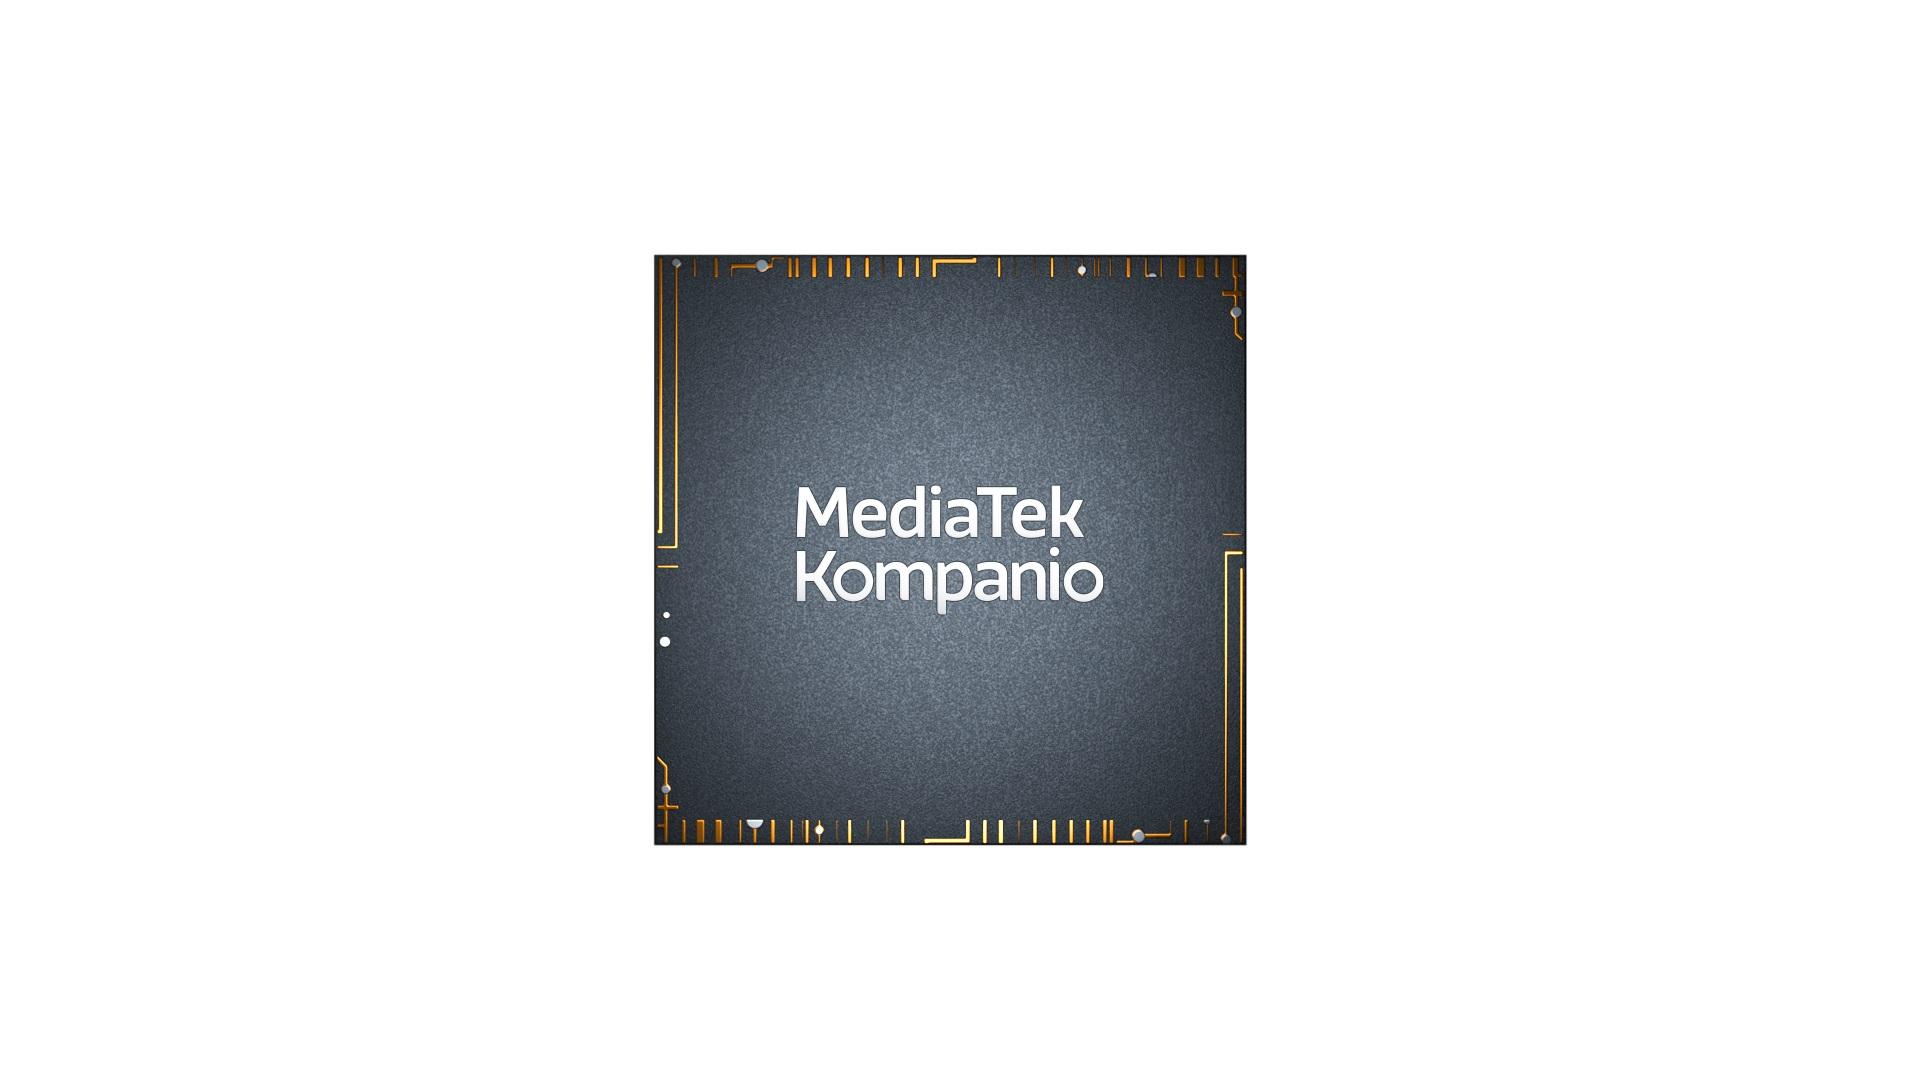 MediaTek Kompanio chip logo